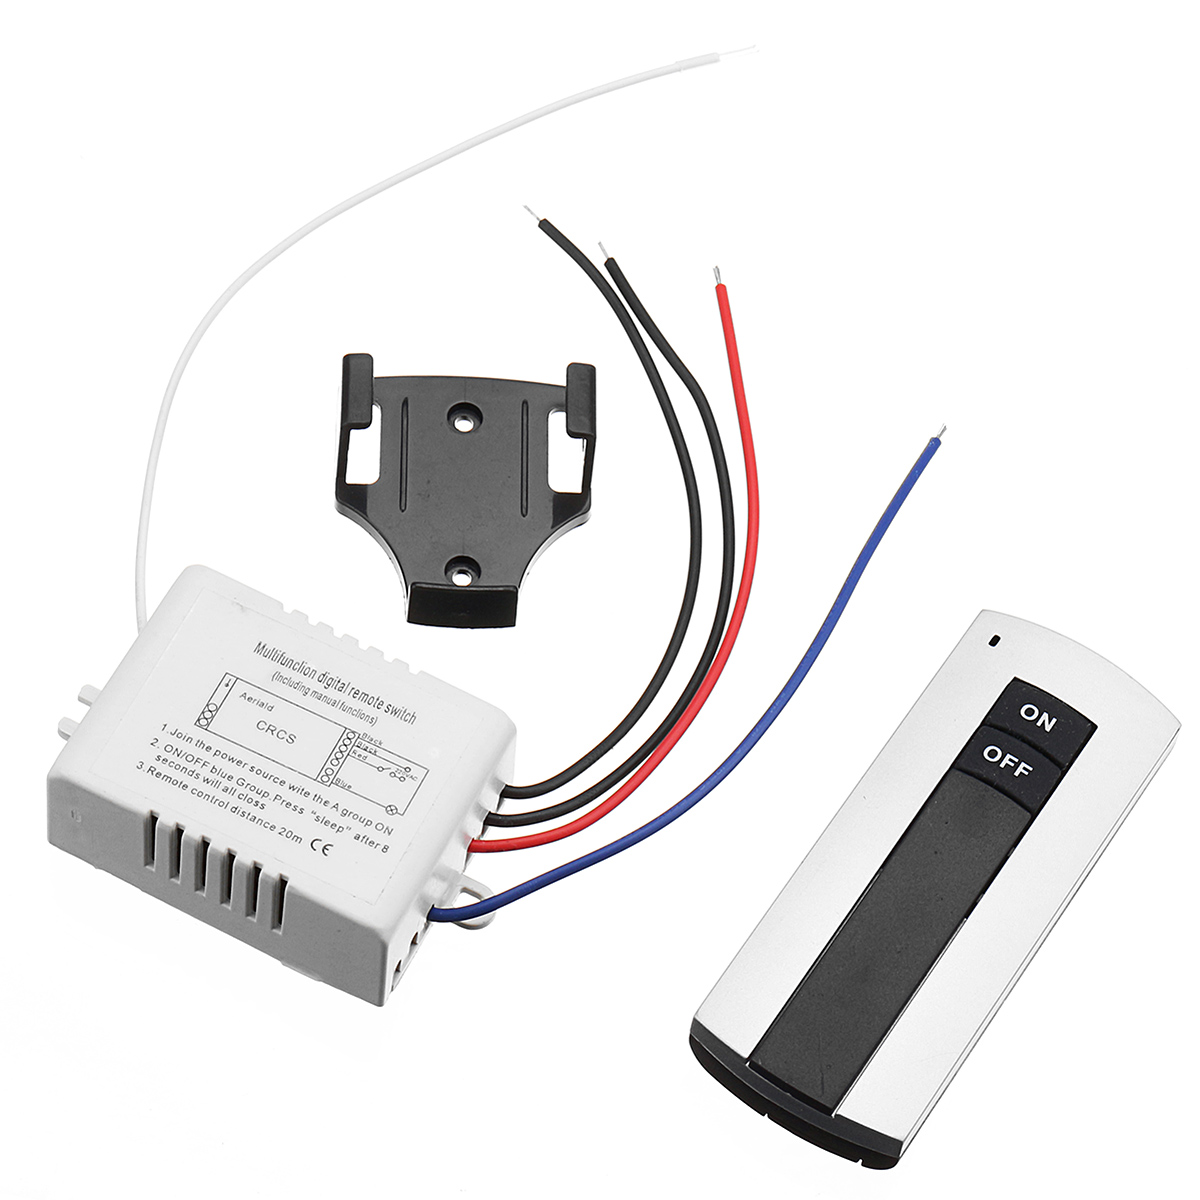 AC 110V/220V 1 Way ON/OFF Lamp Light Digital Switch Dual Button Wireless